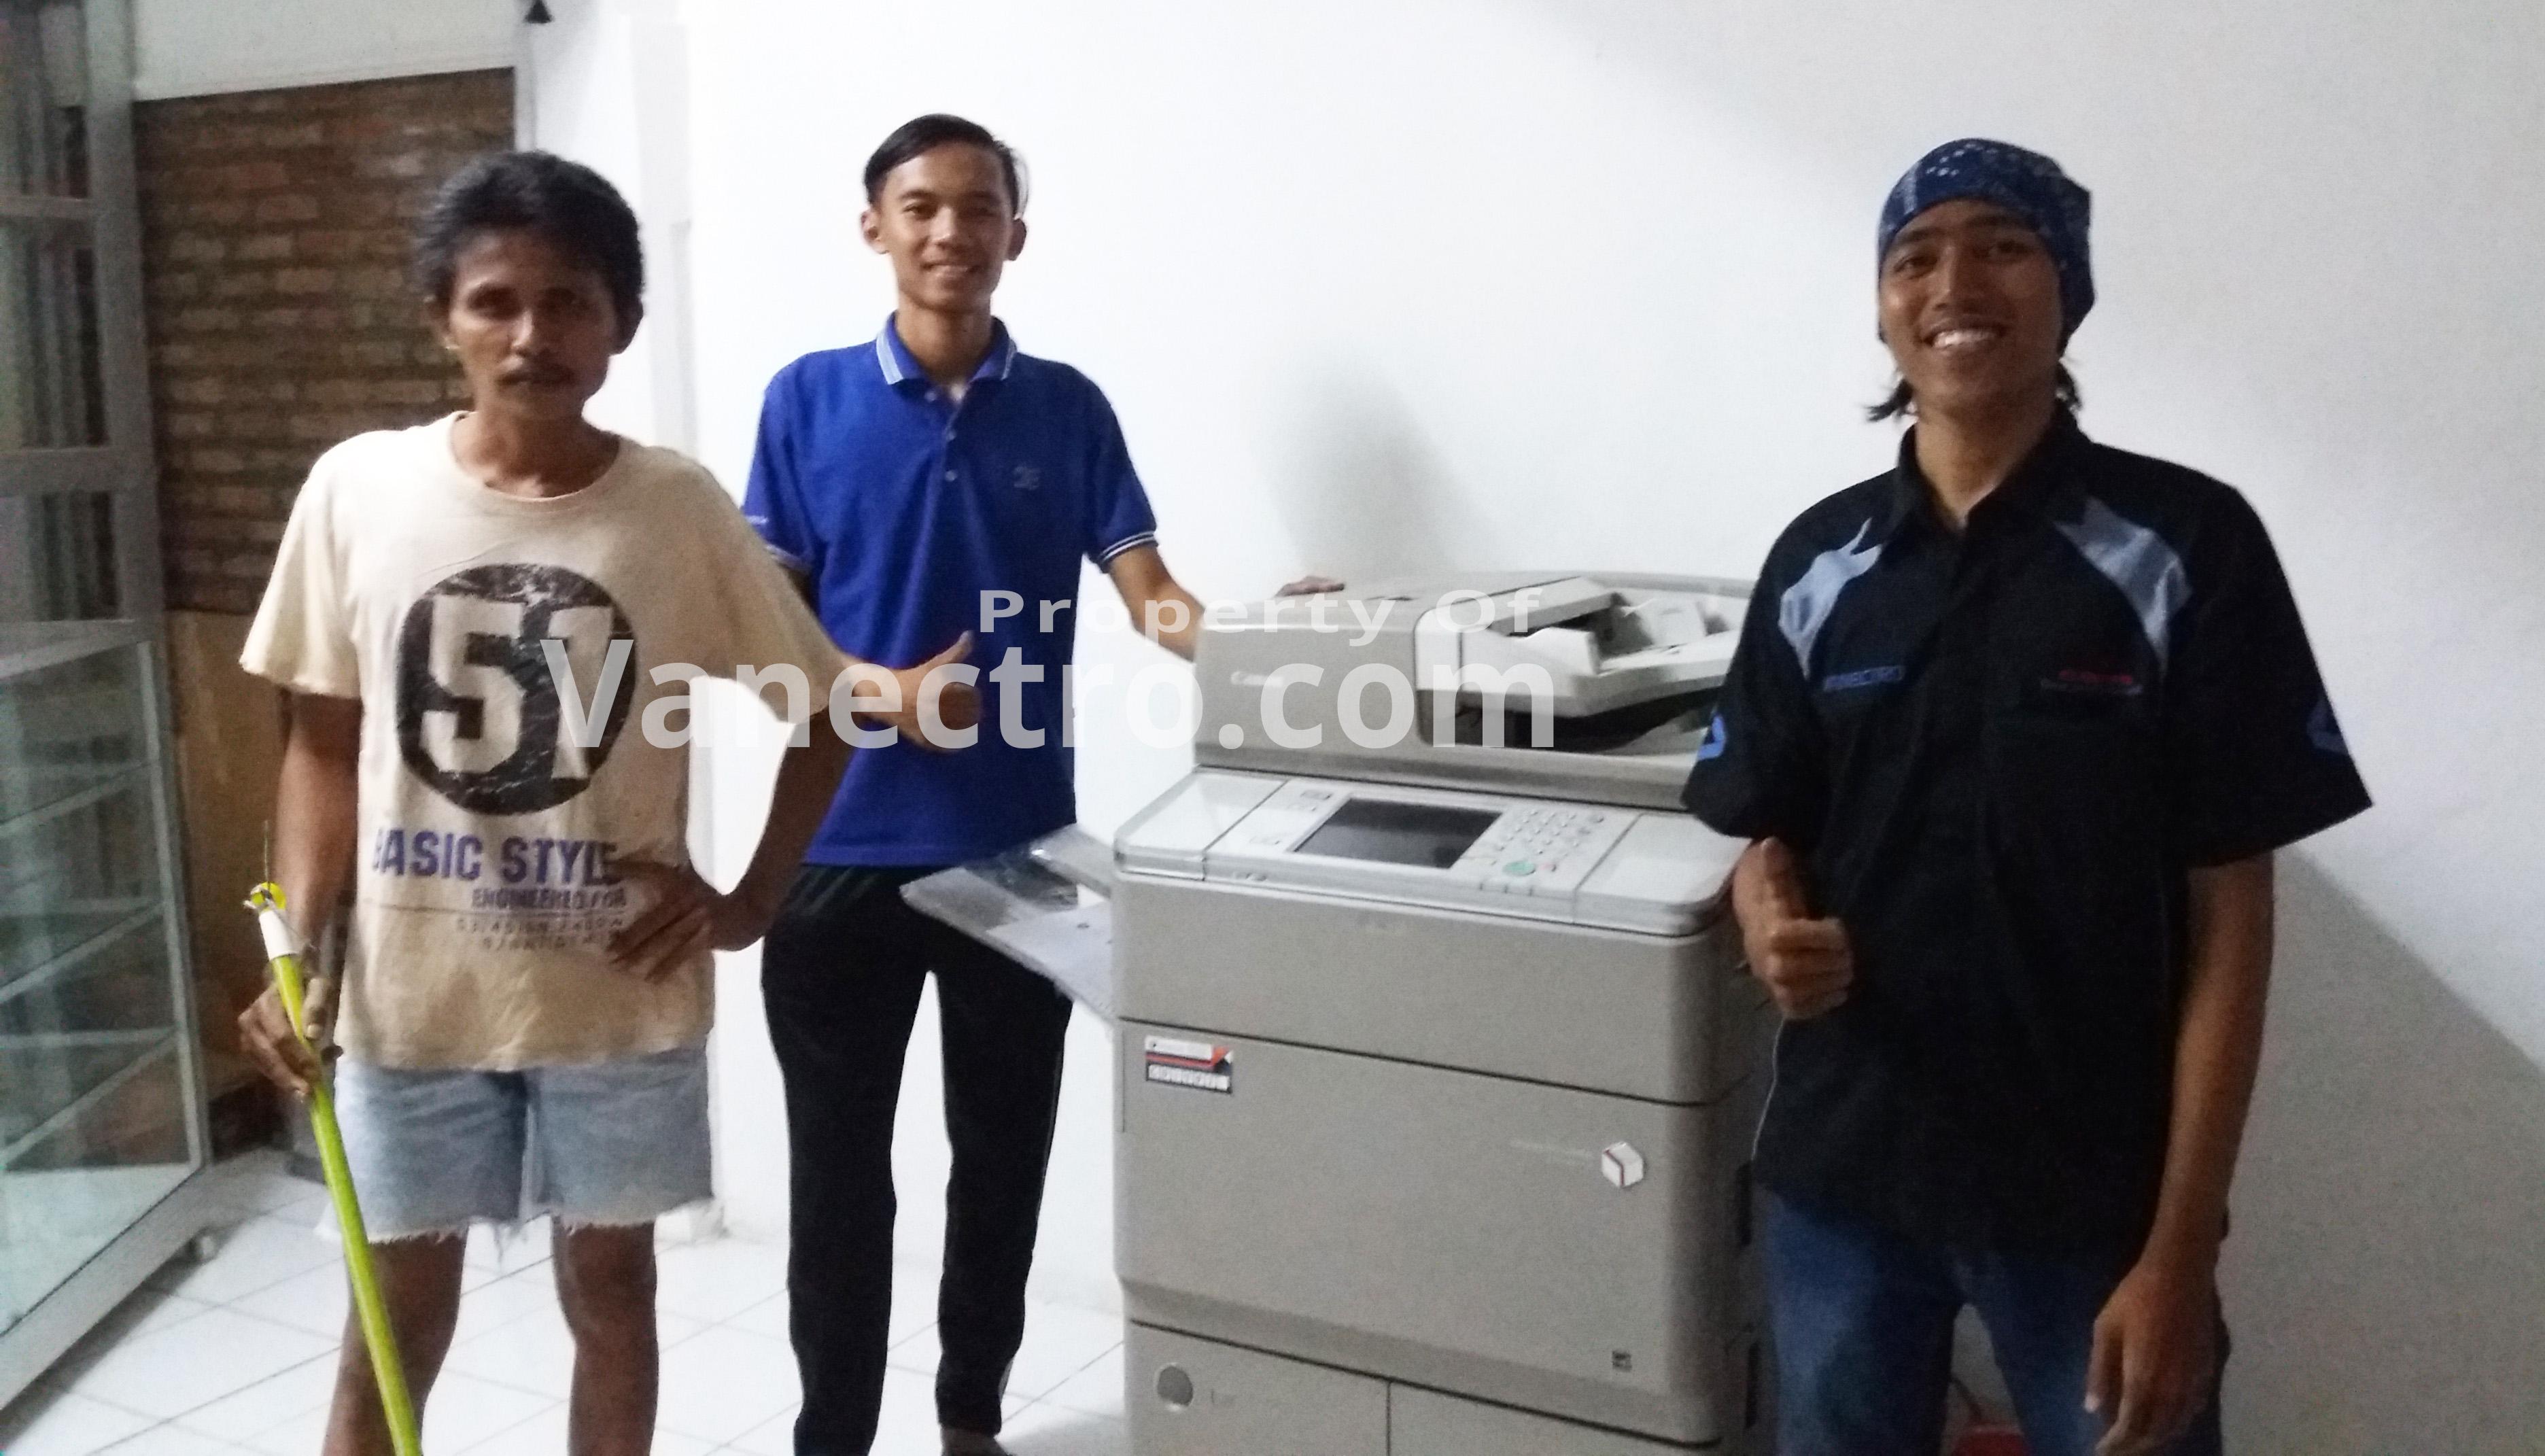 Pengiriman Penjualan Mesin Fotocopy Mesin Fotocopy Canon Ira 6065 | 6055 Milik Bp. Roni